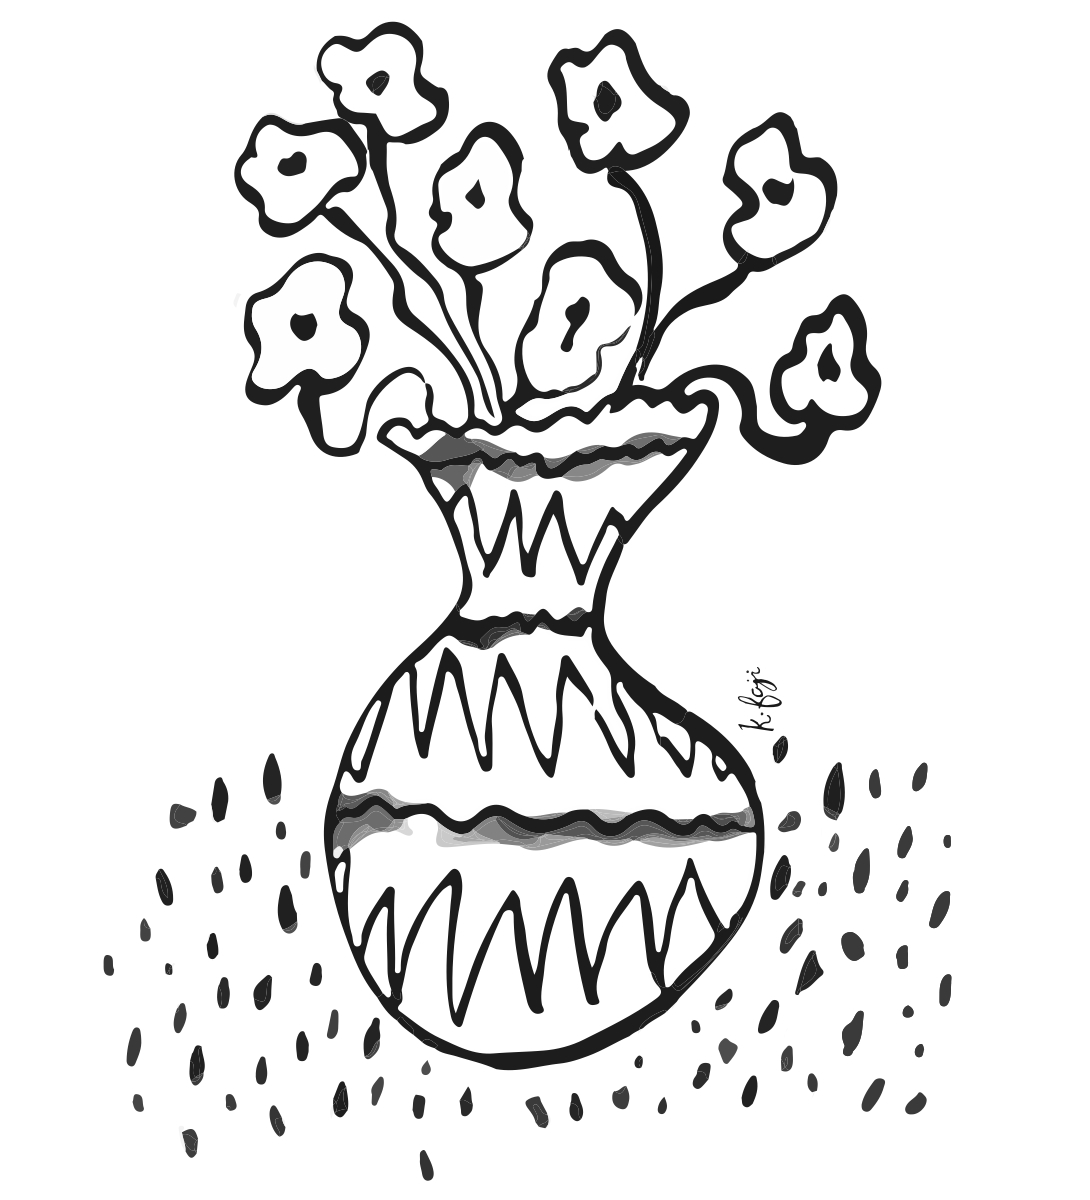 pottedplants_03.jpg